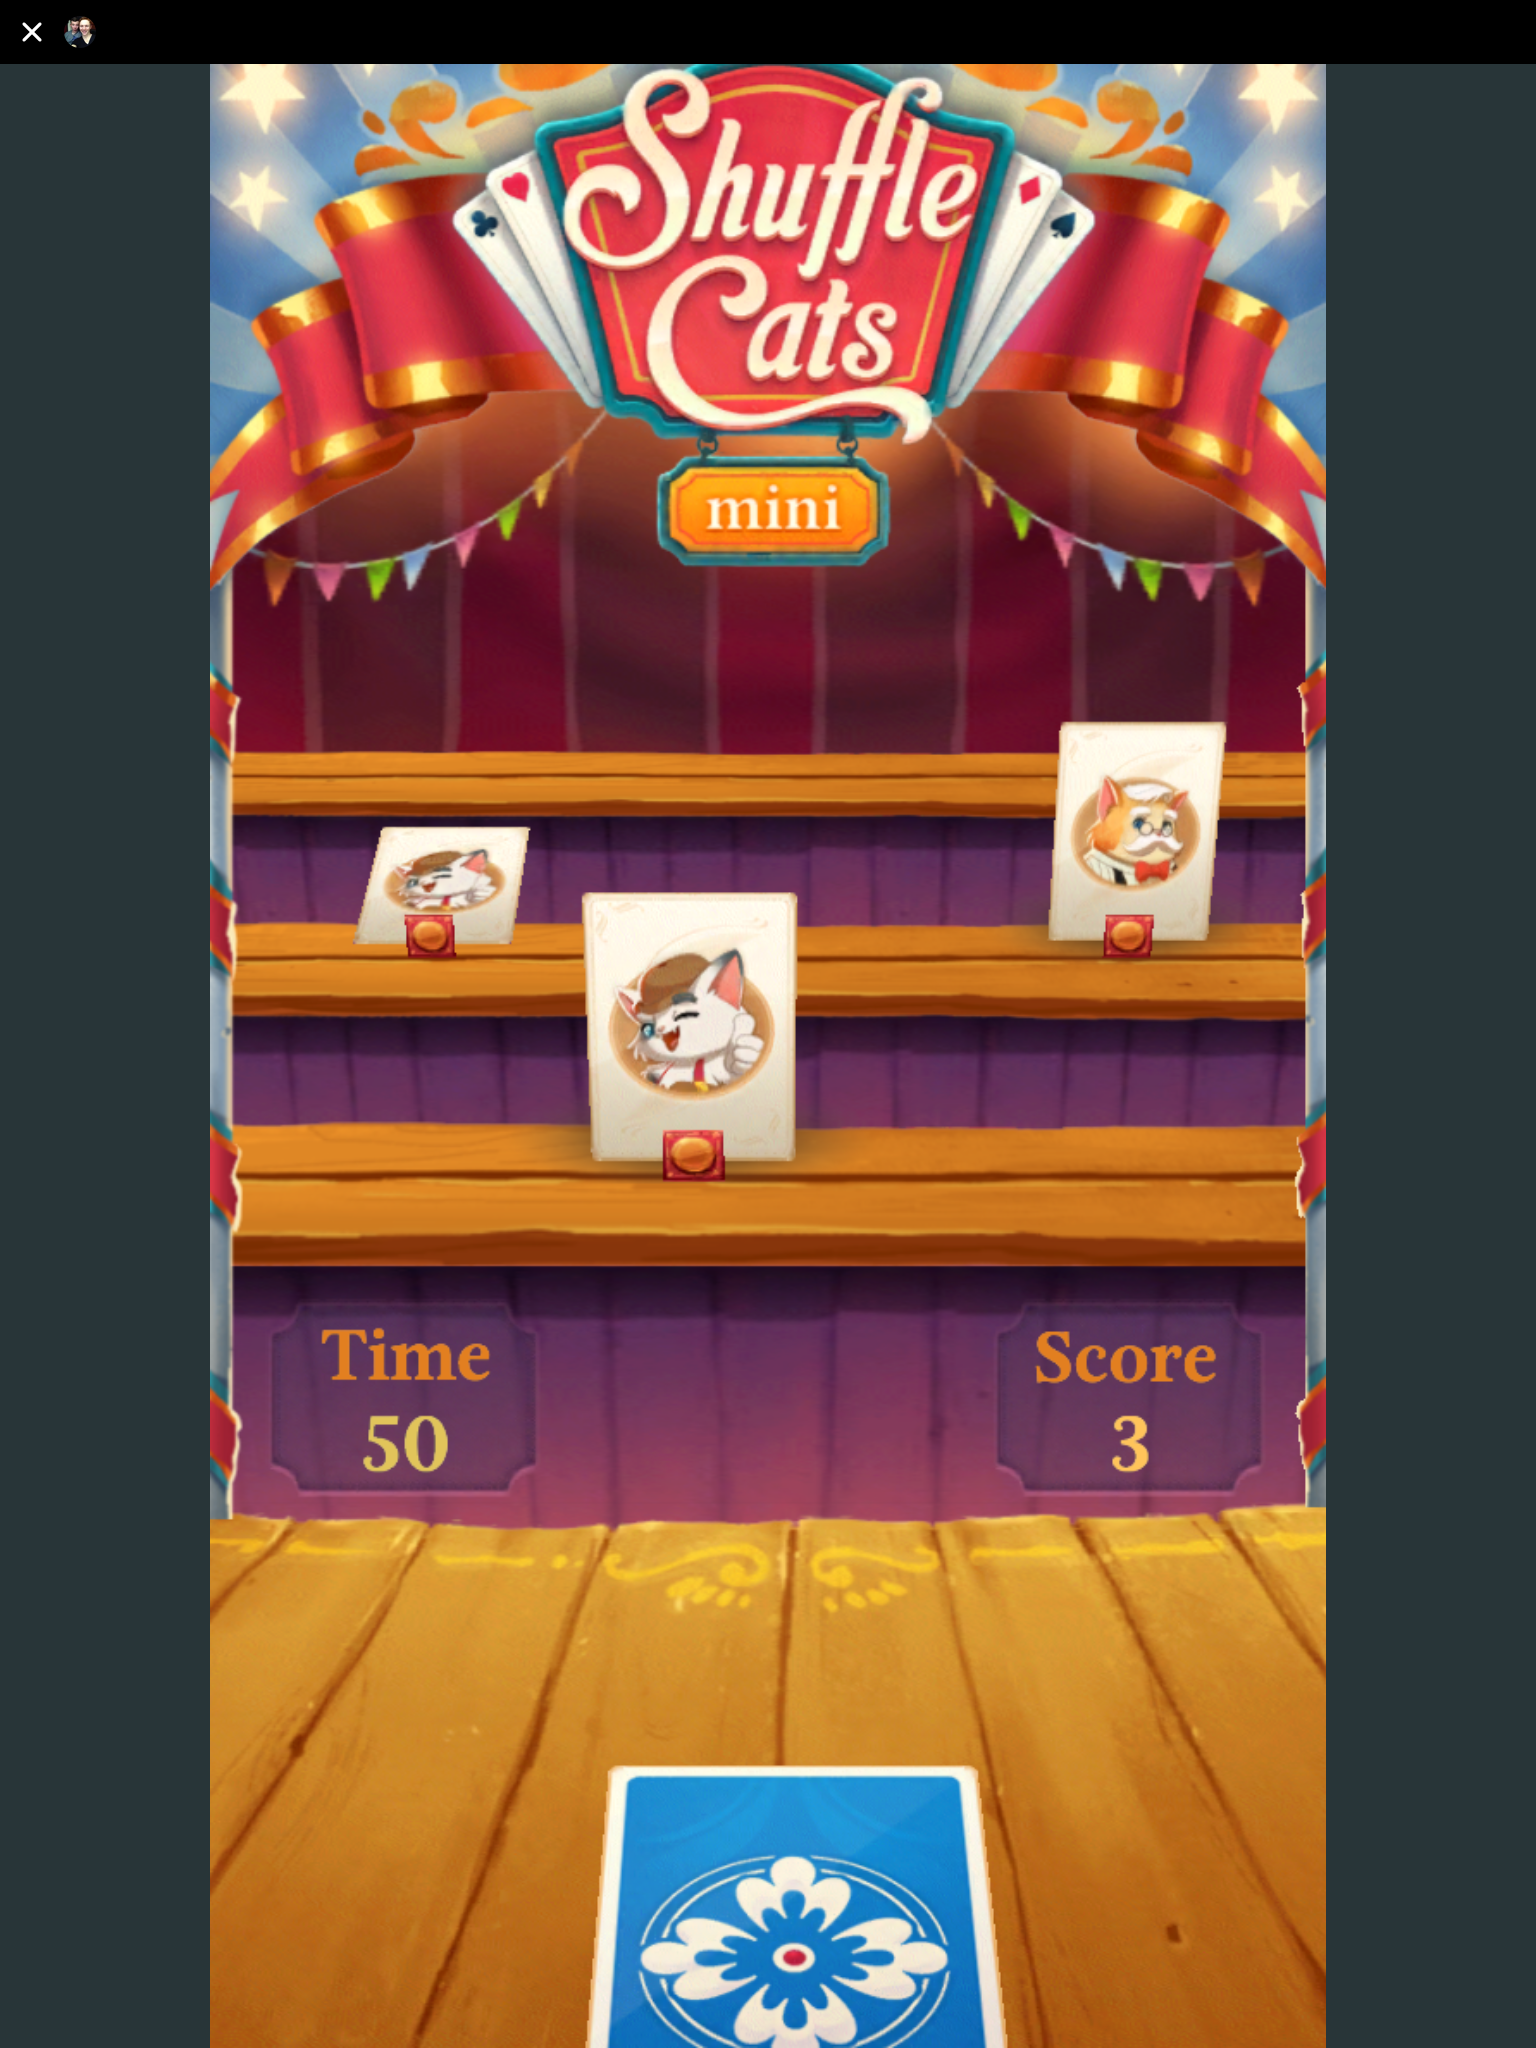 Shuffle Cats Mini Facebook Messenger review | Articles | Pocket Gamer